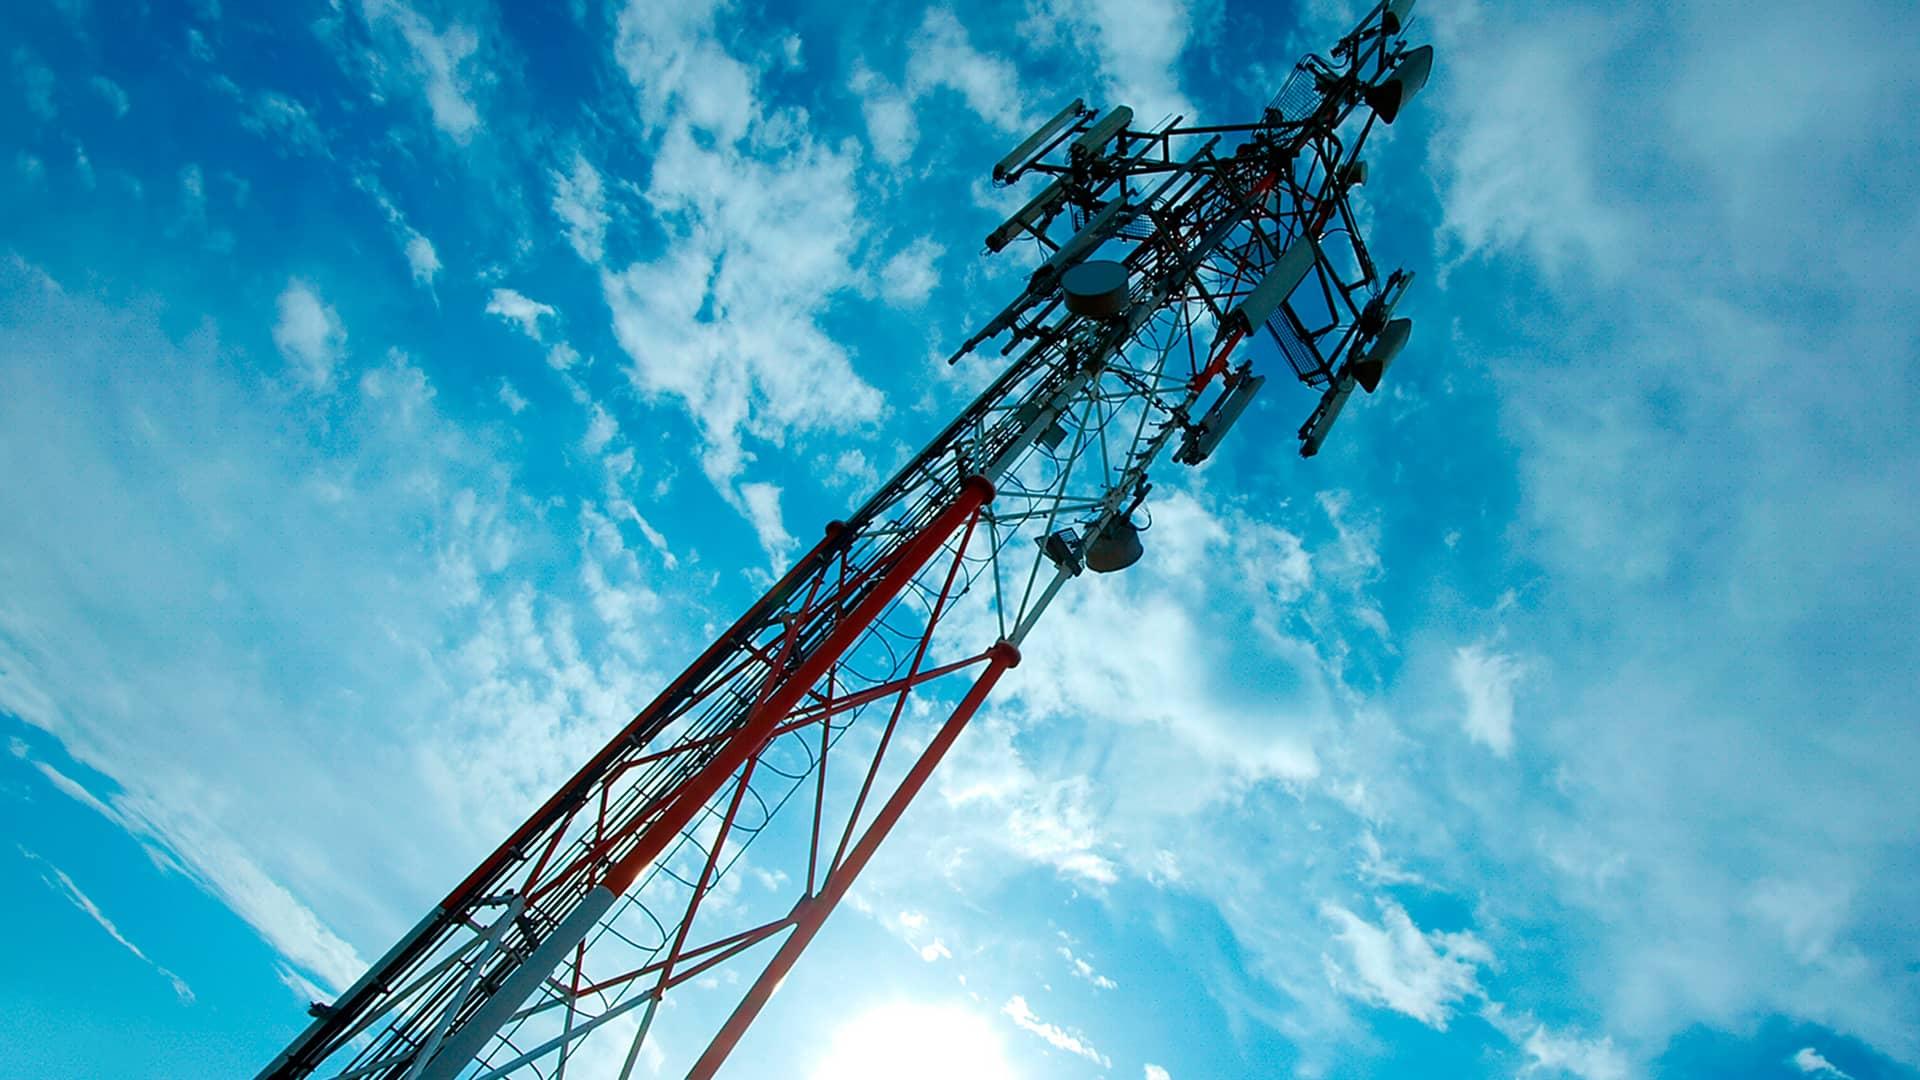 Antena simboliza tecnología moviles 5g